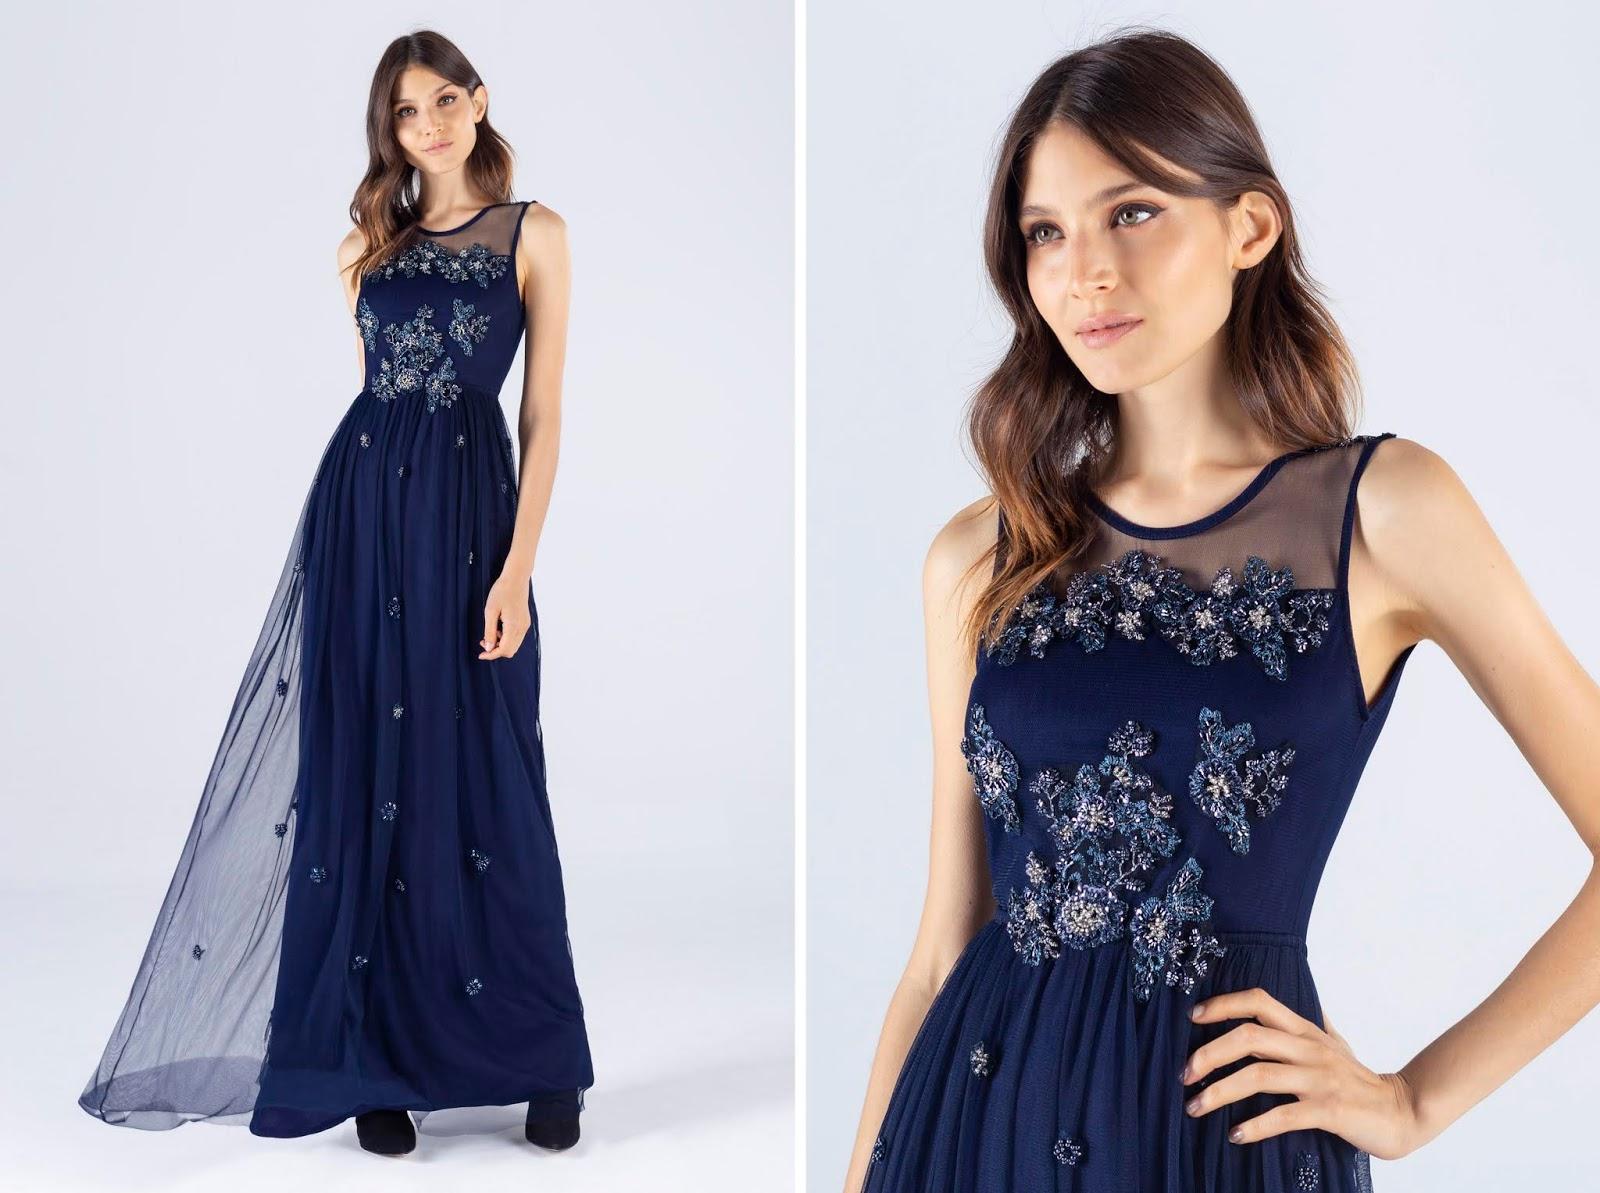 Vestido de fiesta azul 2020. Moda vestido de fiesta 2020.